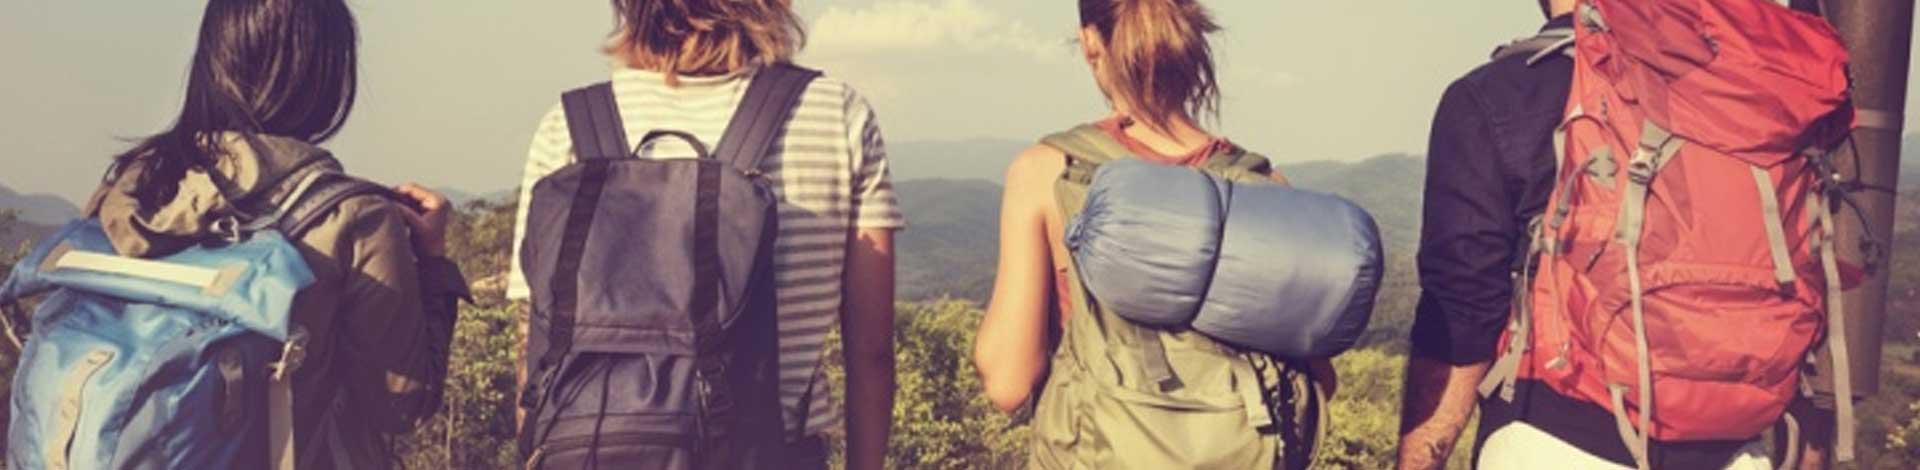 Solo-friends-travel